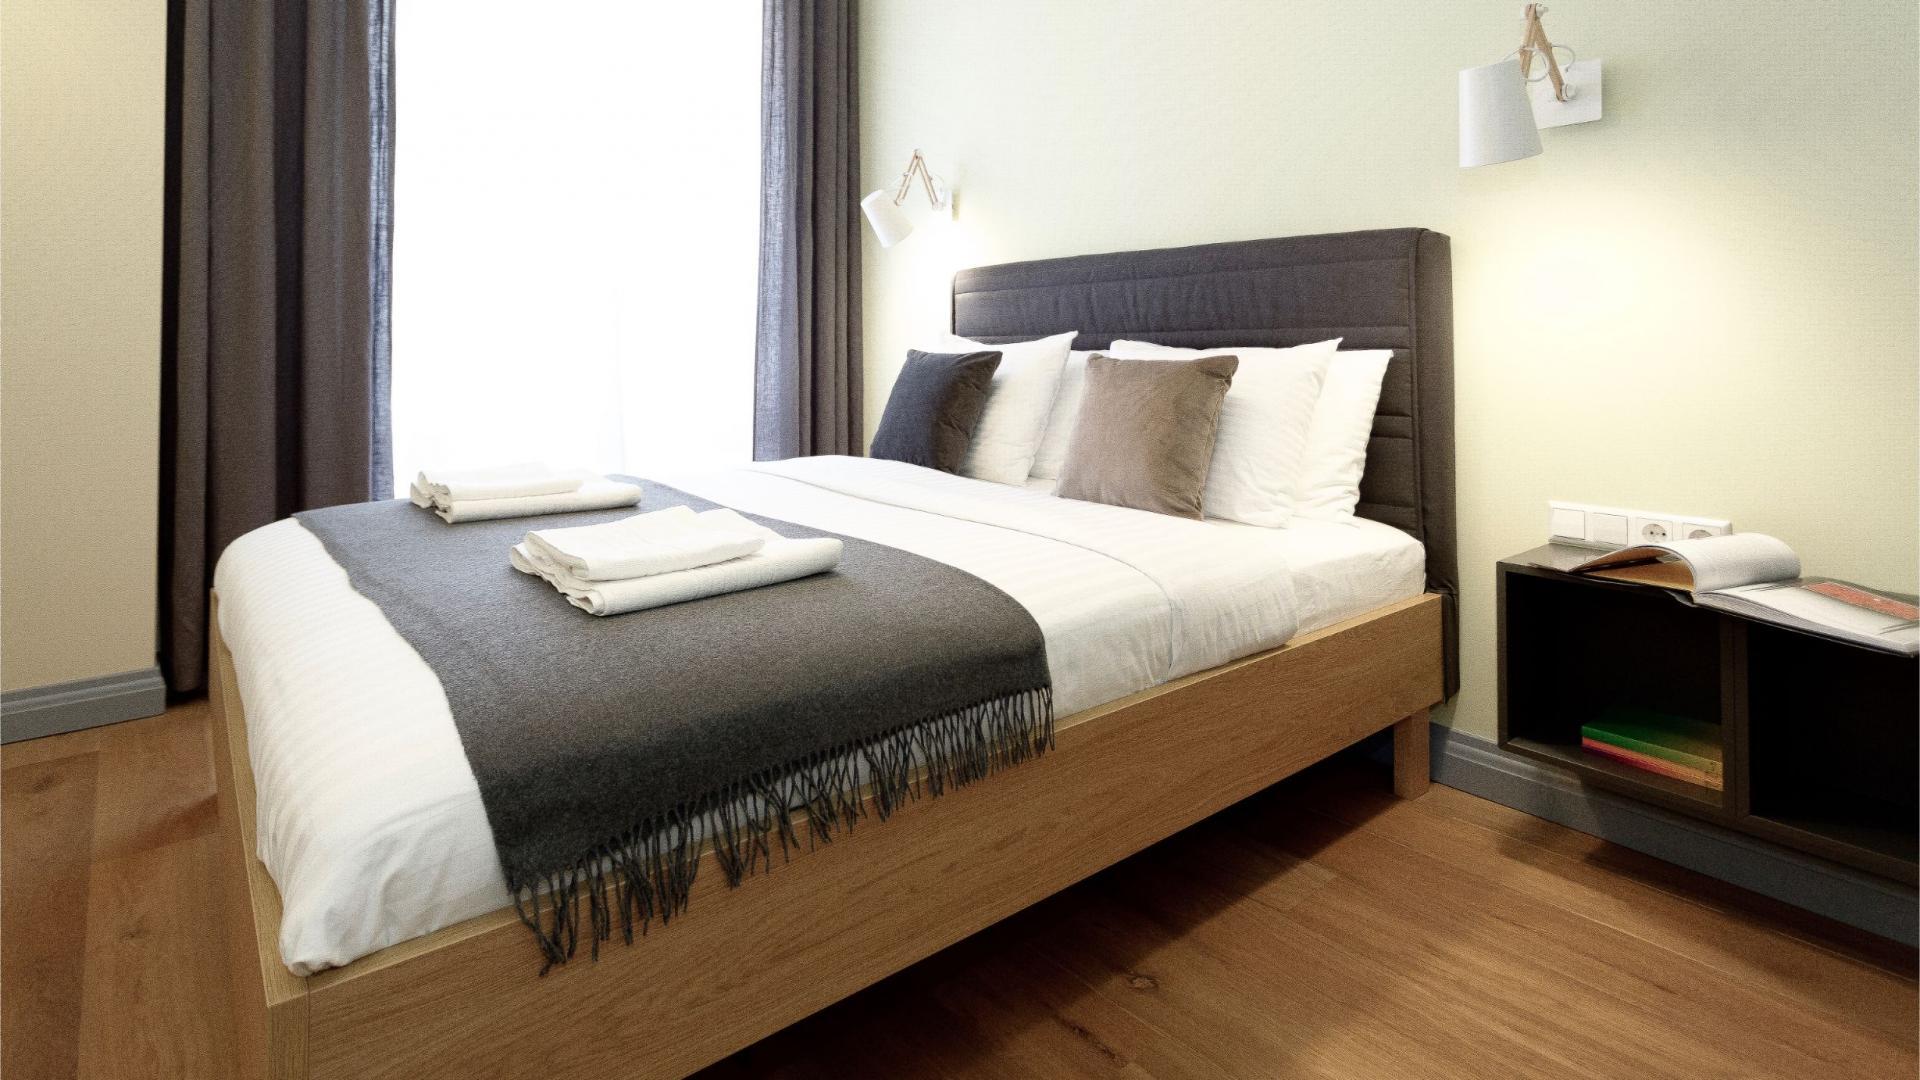 Bedroom at Siauliu Town Hall Apartment